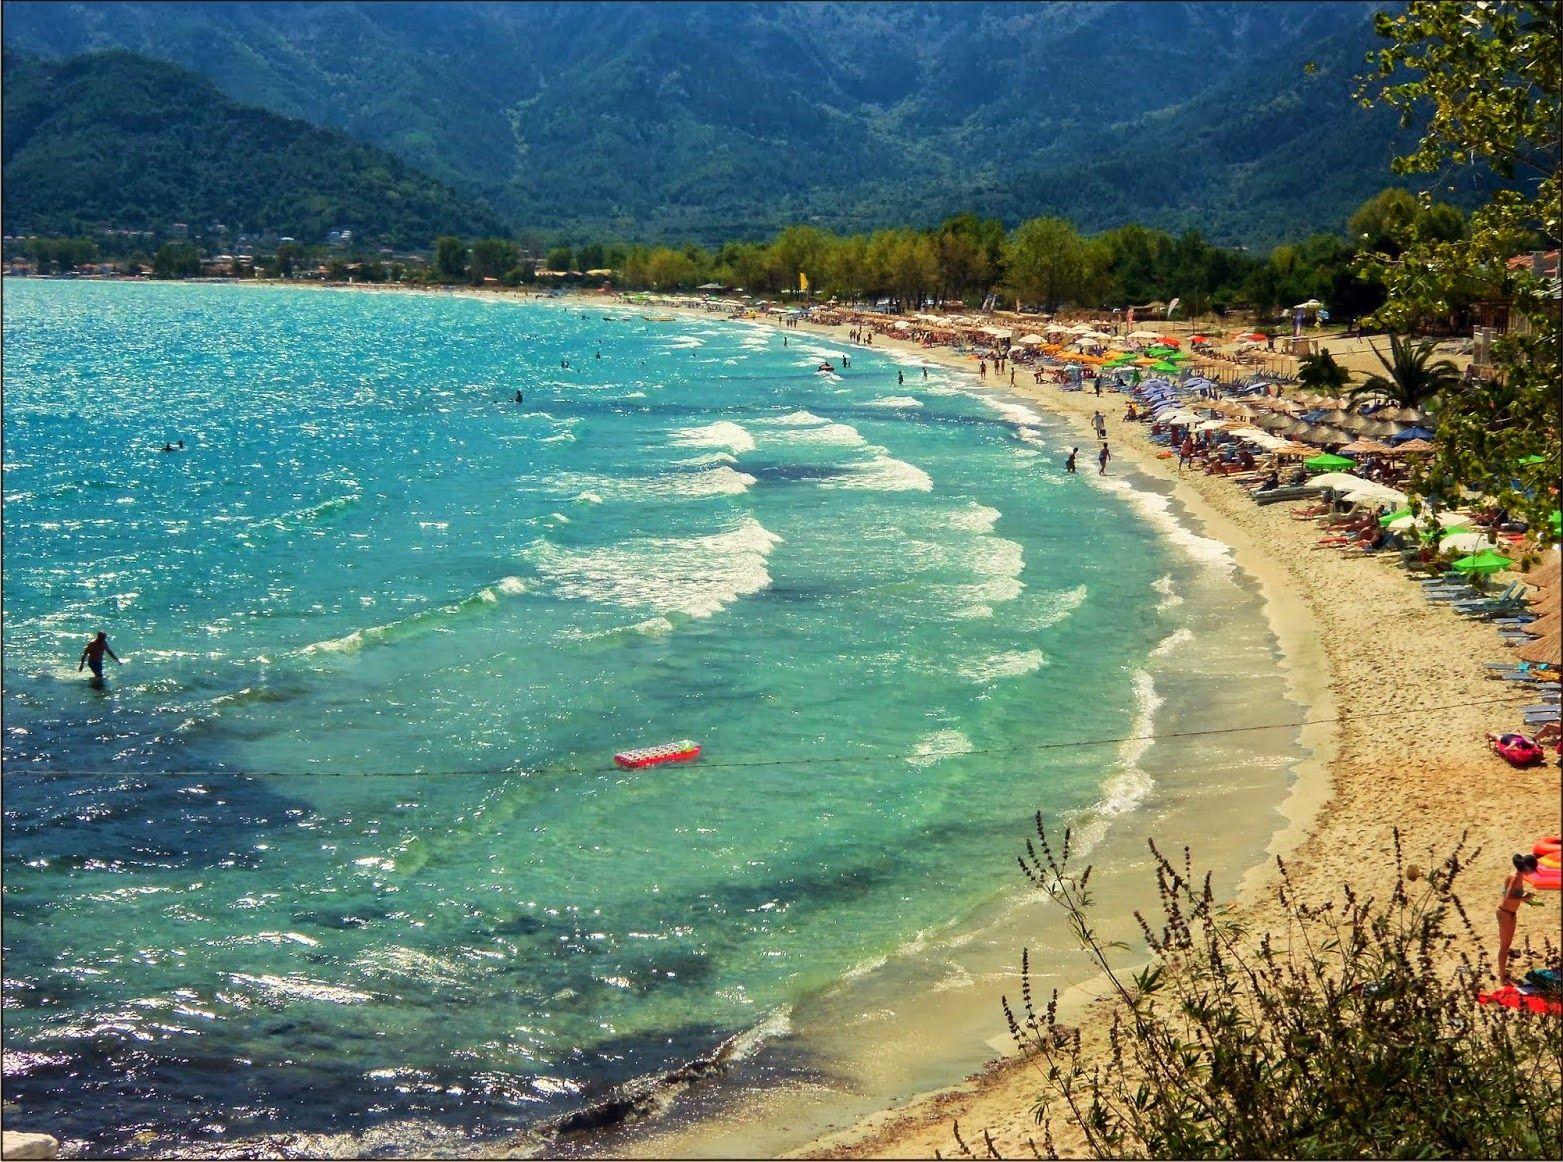 Insula Thassos Grecia Poze Super Misto Insule Grecia Călătorii